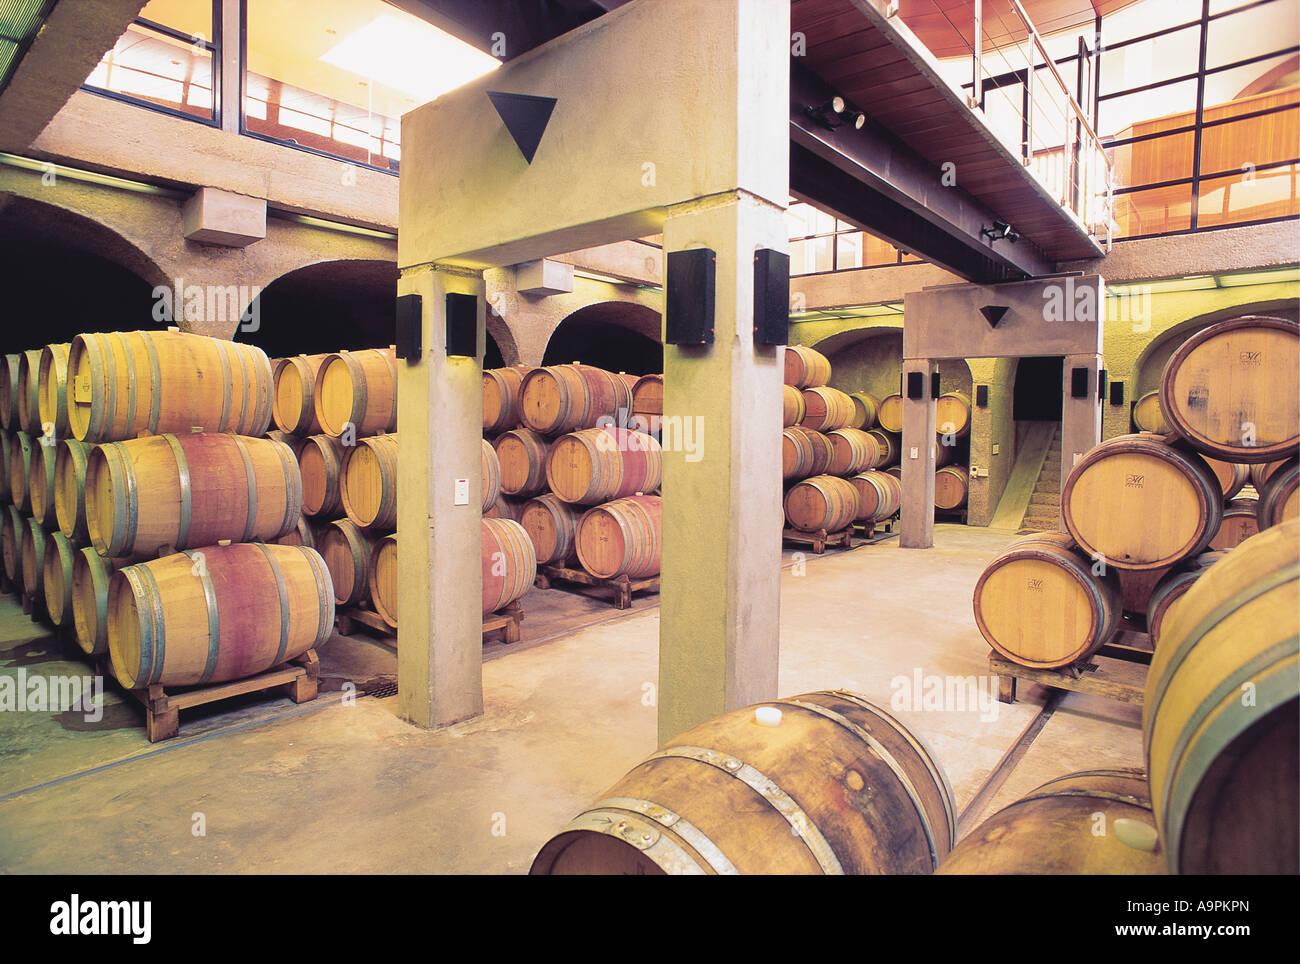 Wine Storage Containers Barrels Wooden Barrel Stock Photos Wine